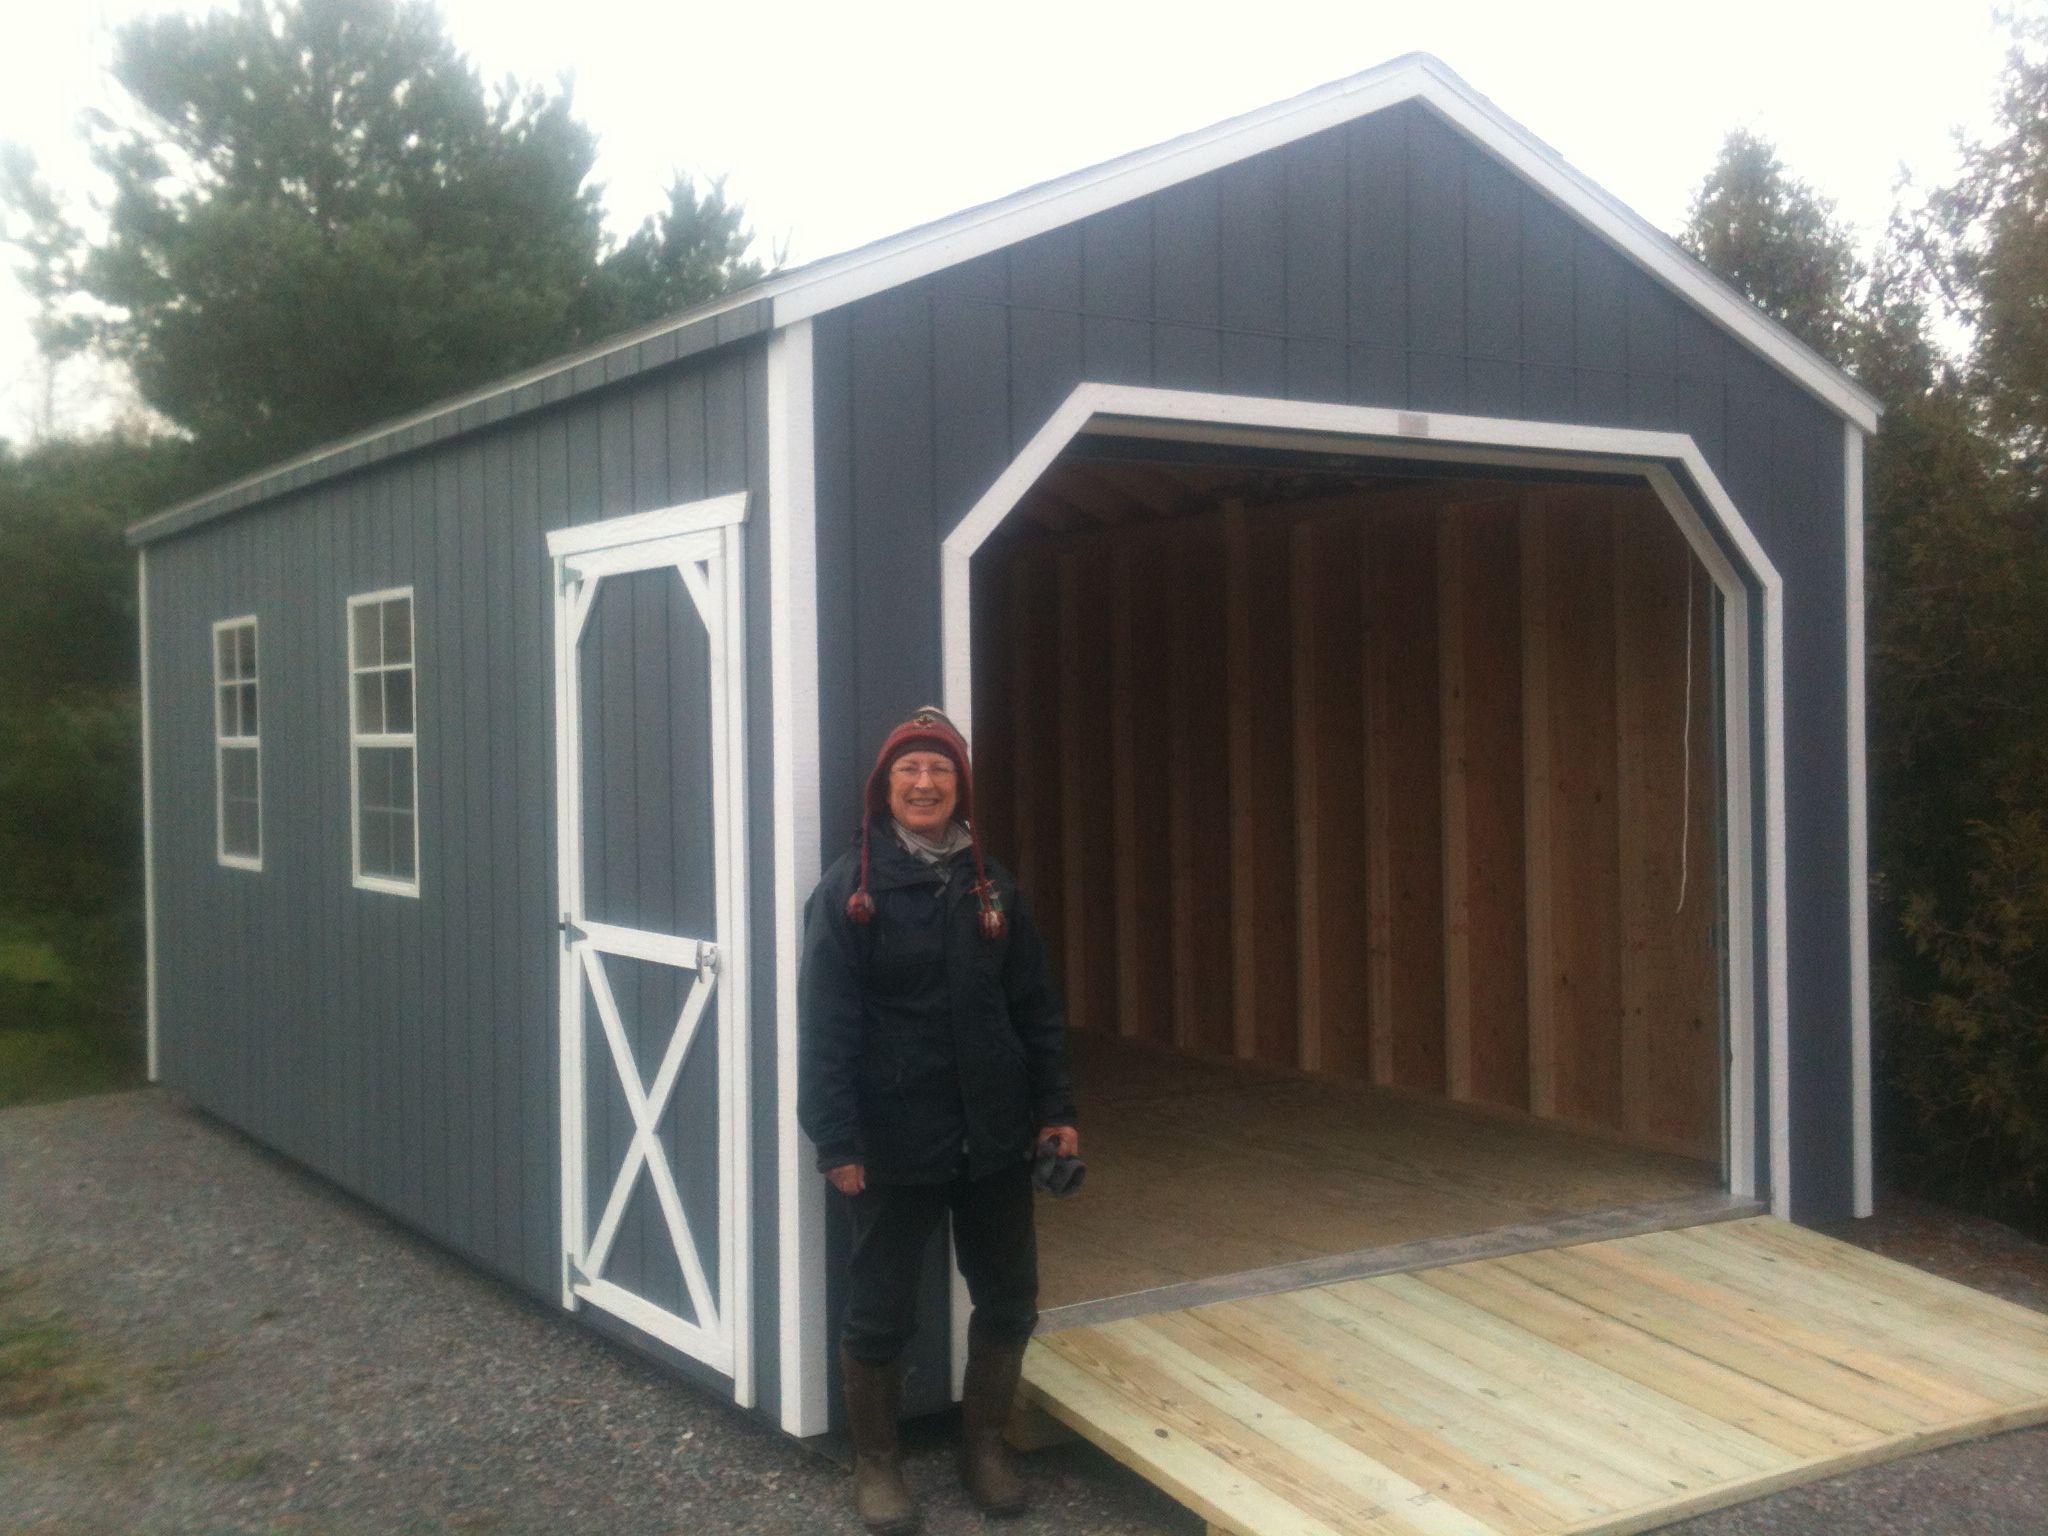 12' X 20' Wooden Portable Garage Delivered Fully